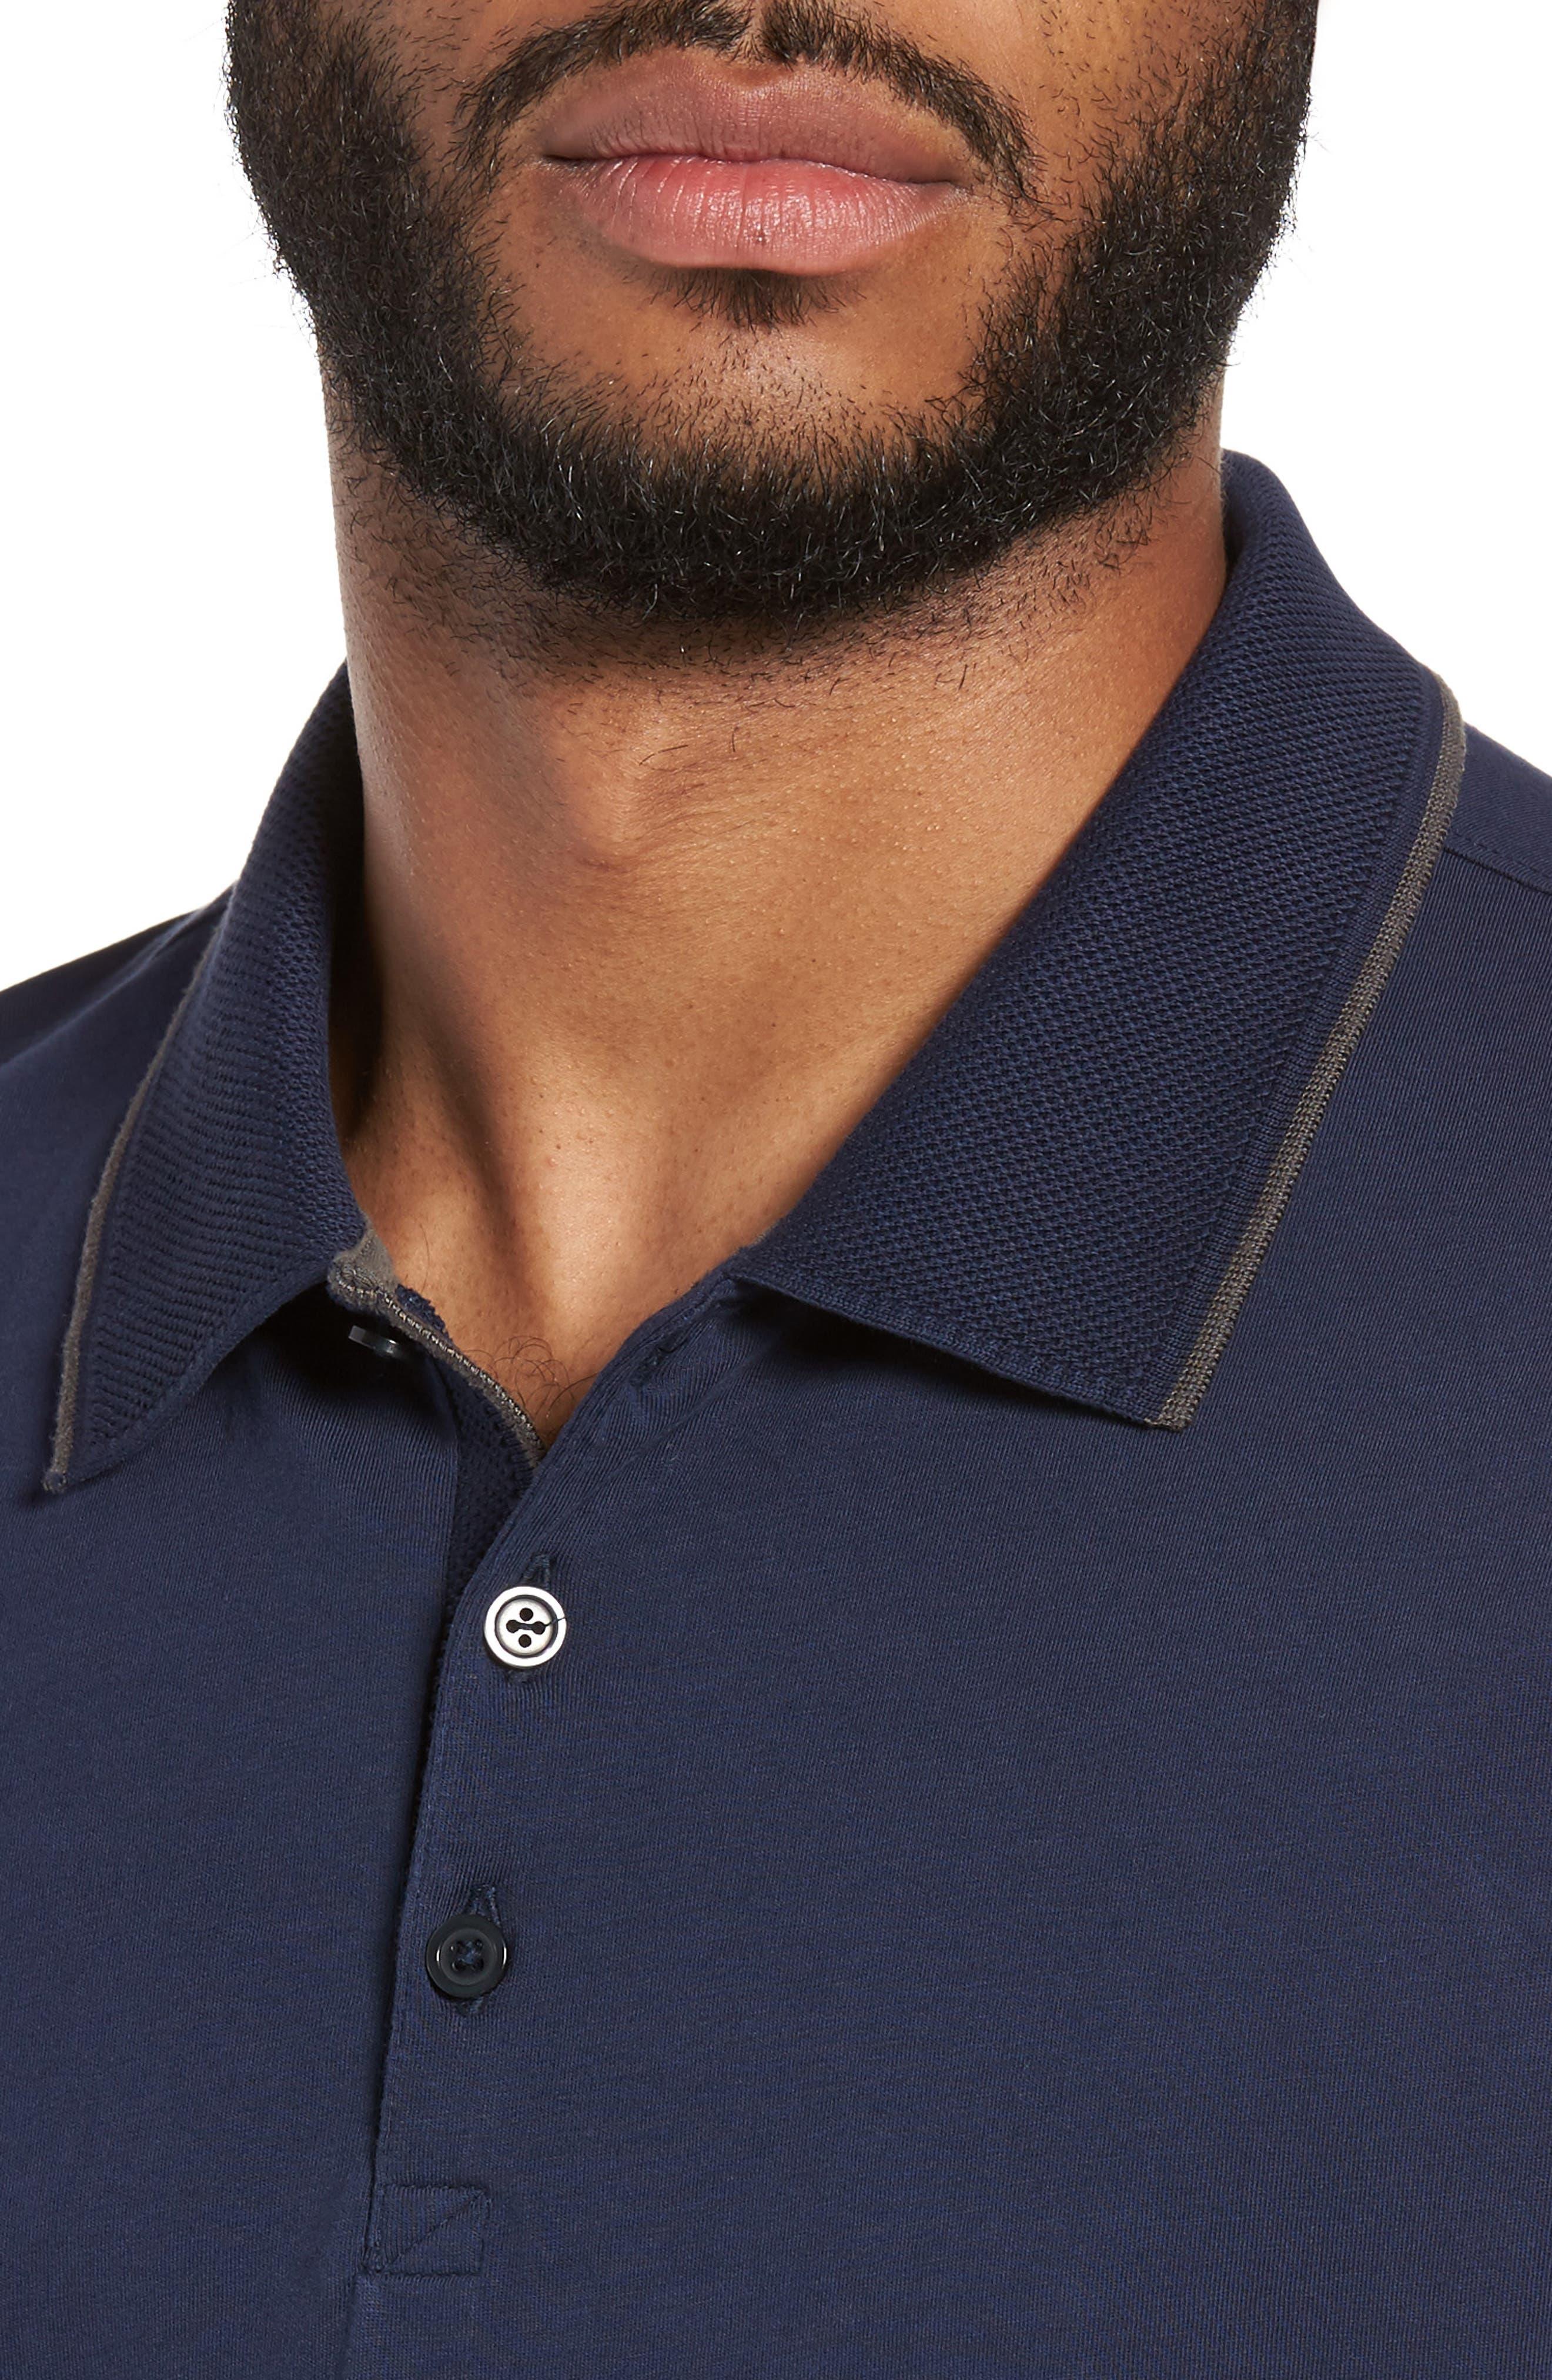 Grindstone Slim Fit Polo,                             Alternate thumbnail 4, color,                             410